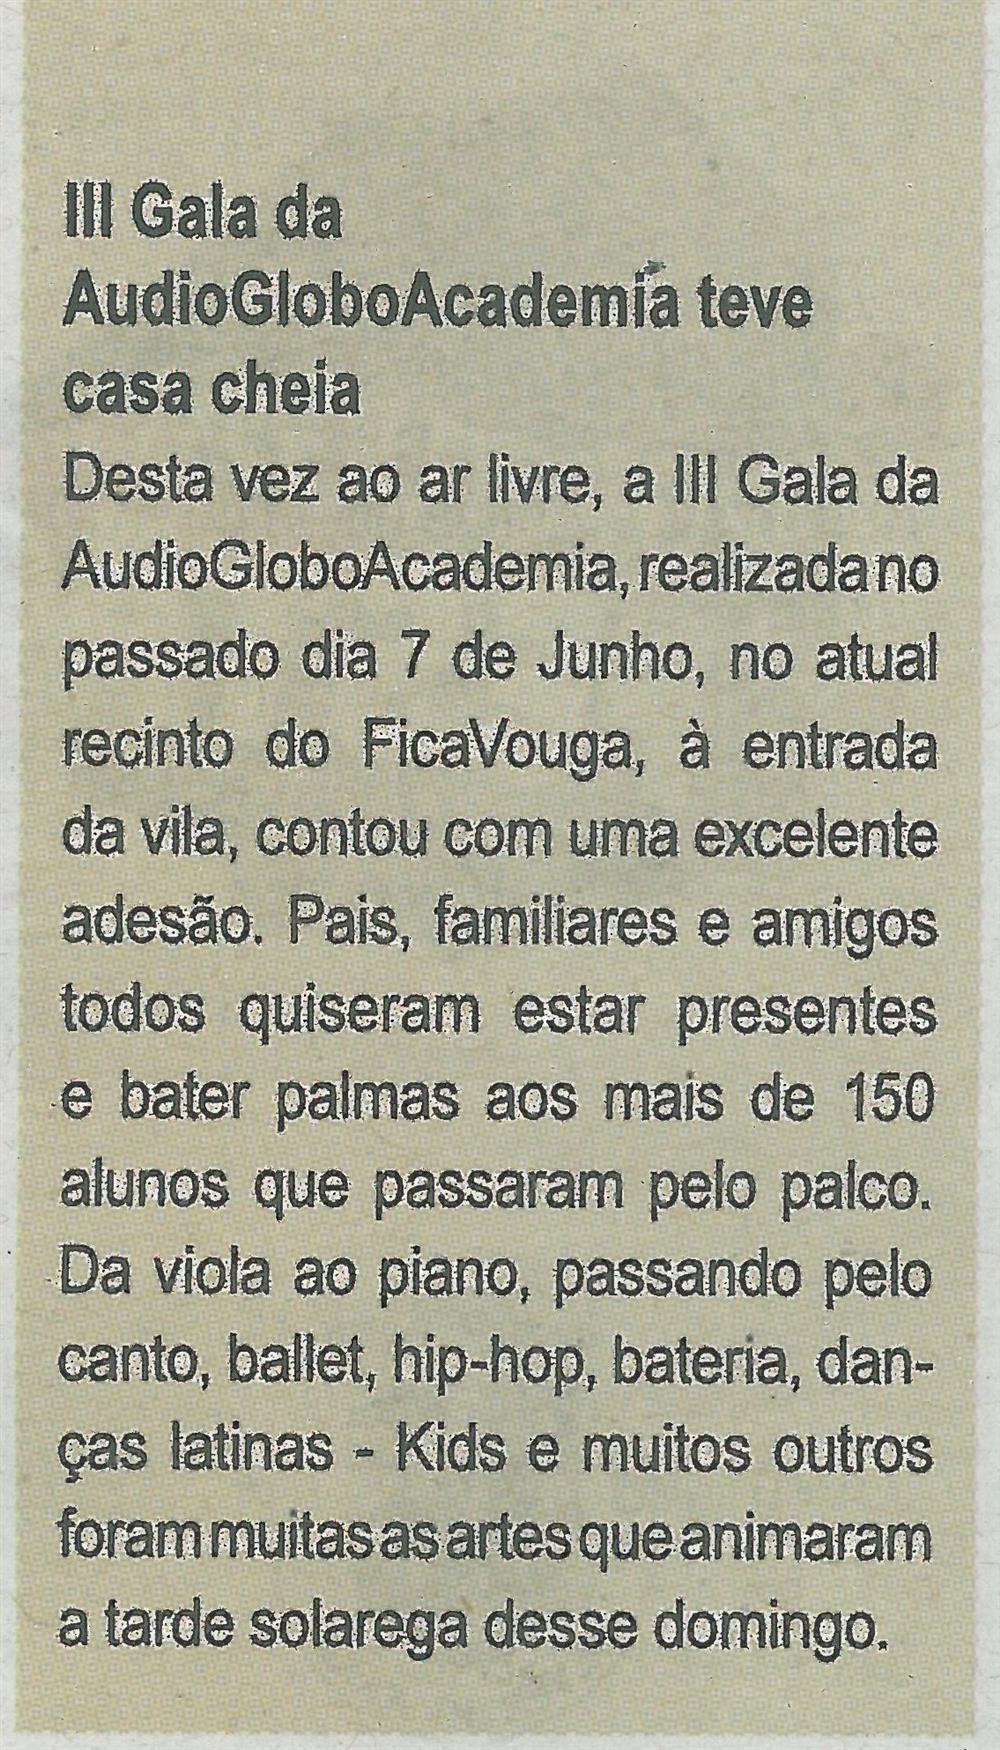 GB-25jun.'15-p.14-III Gala da Audio Globo Academia teve casa cheia.jpg